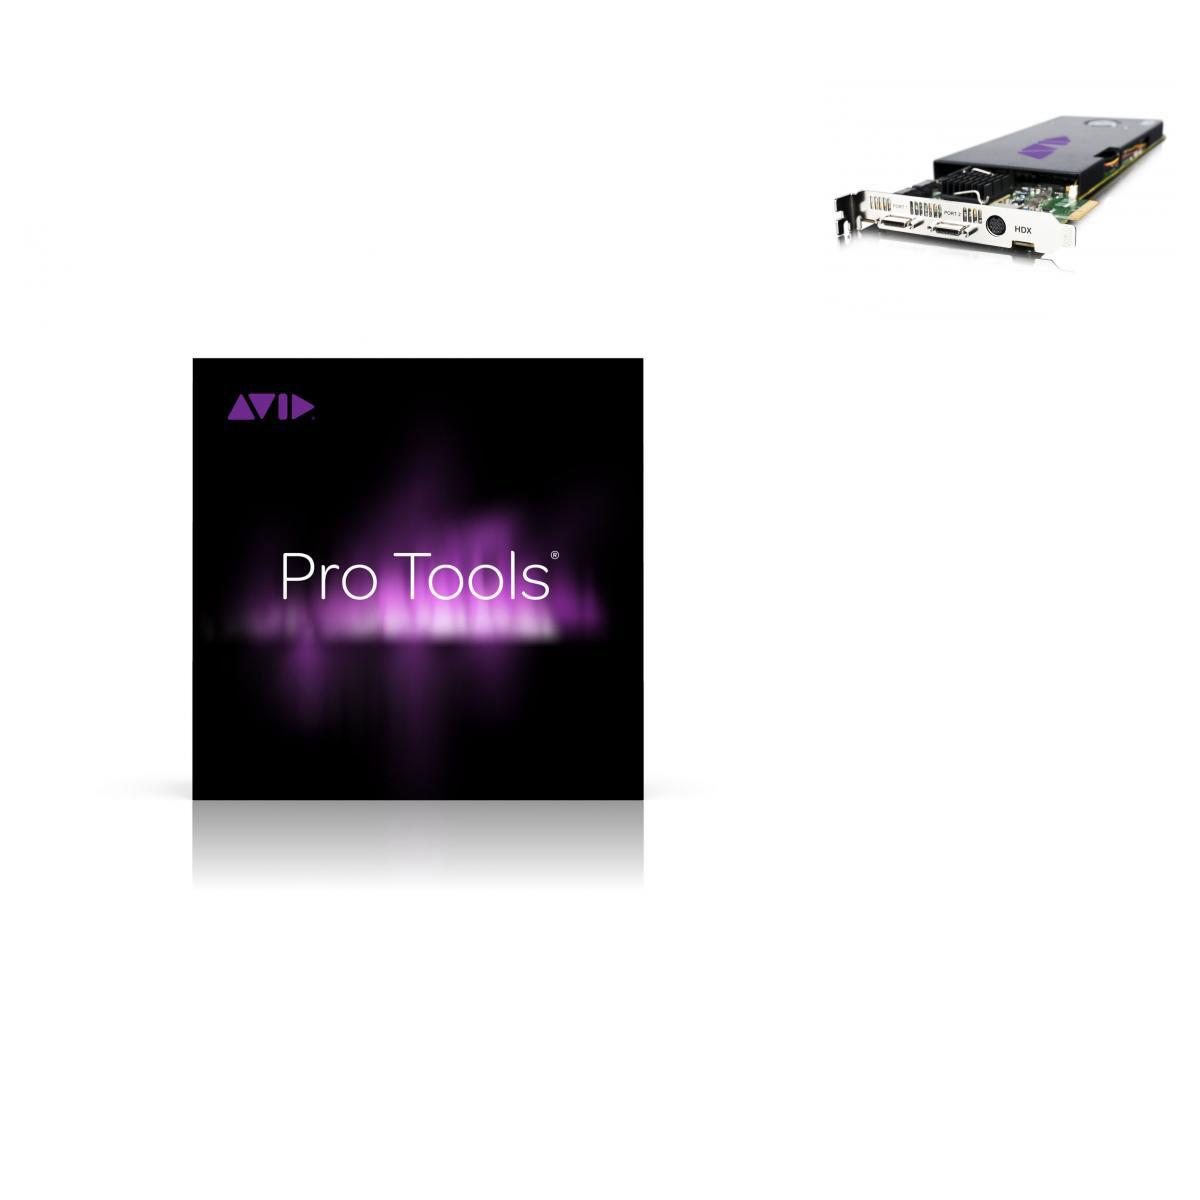 Image Carte Hdx Avec Logiciel Pro Tools Hd